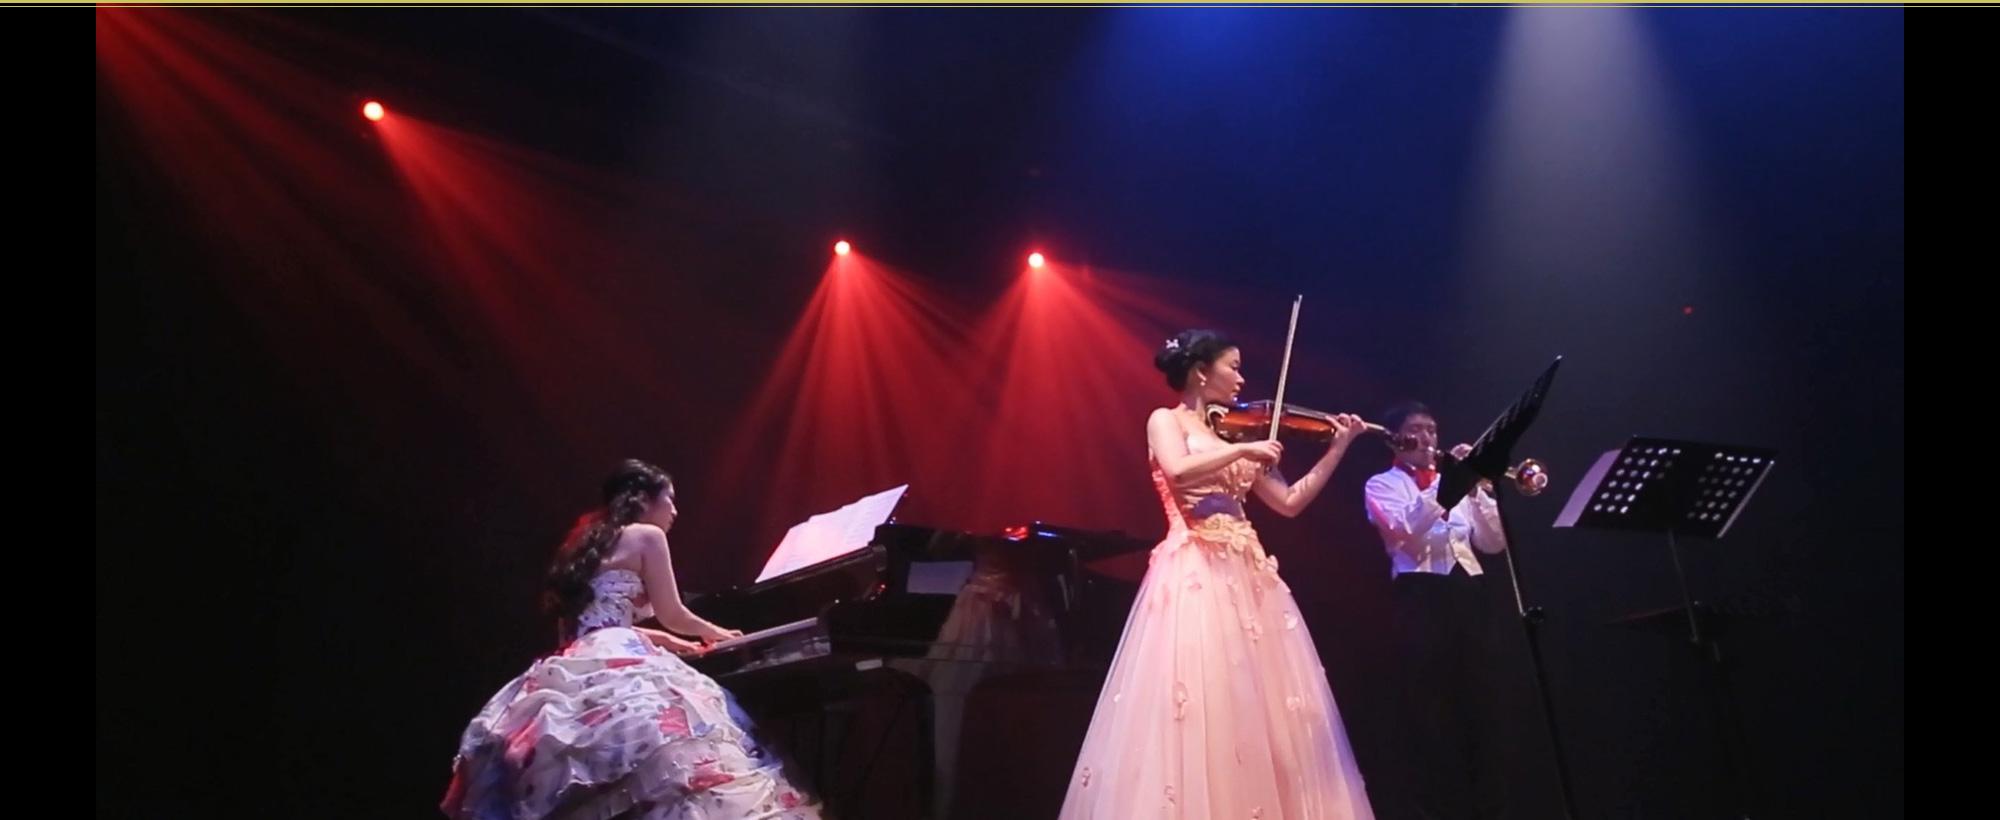 Sプロジェクト・コンサート【公式】